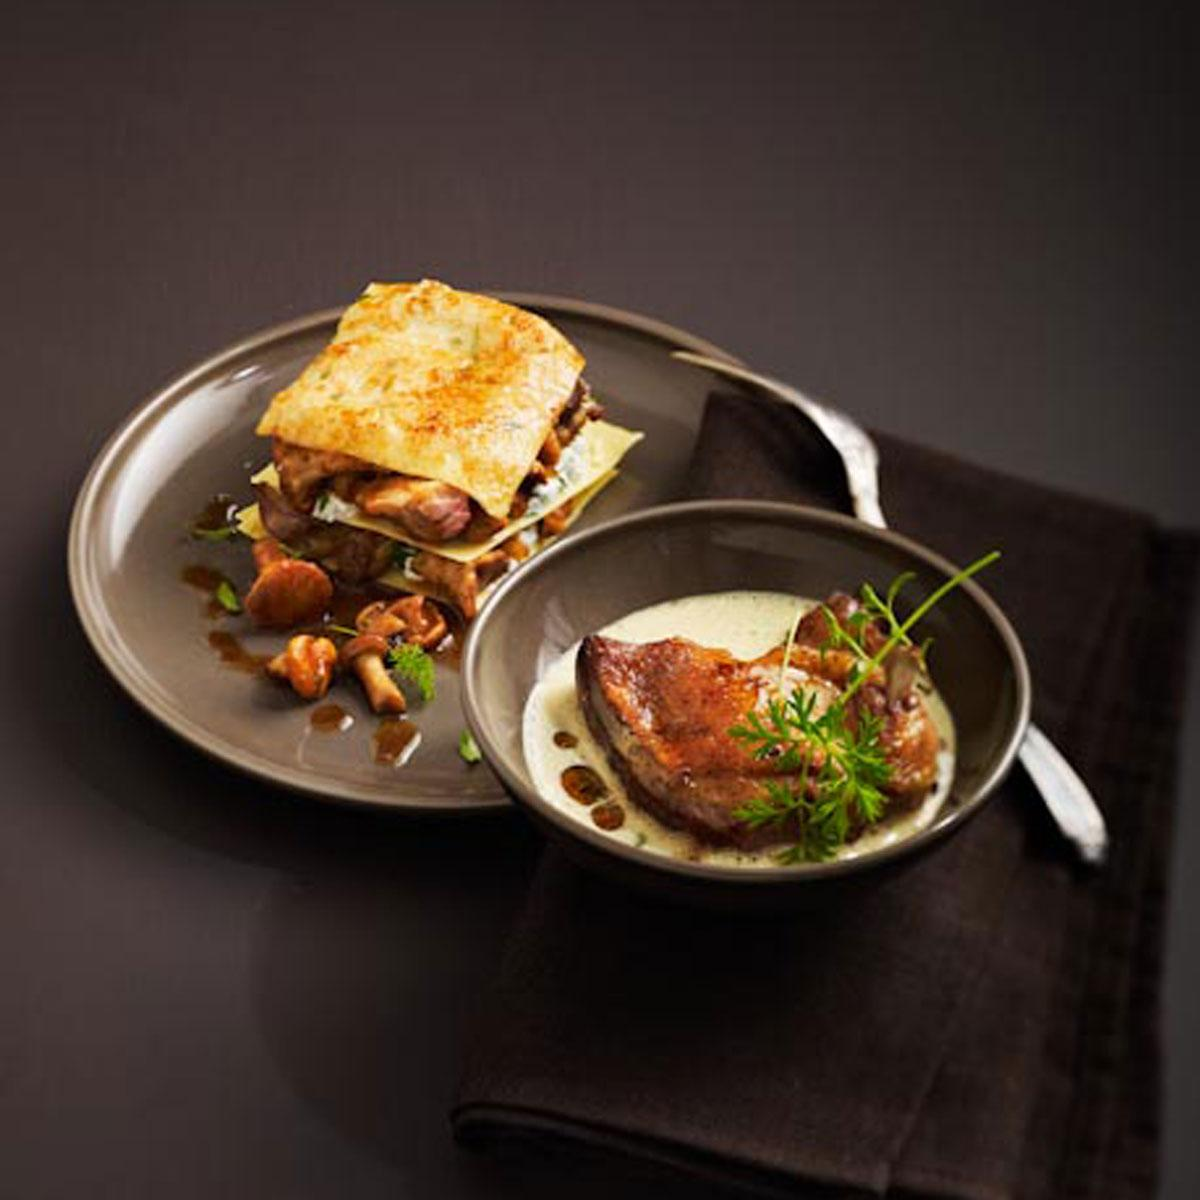 recette filets de pigeon r ti jus de persil plat cuisine madame figaro. Black Bedroom Furniture Sets. Home Design Ideas